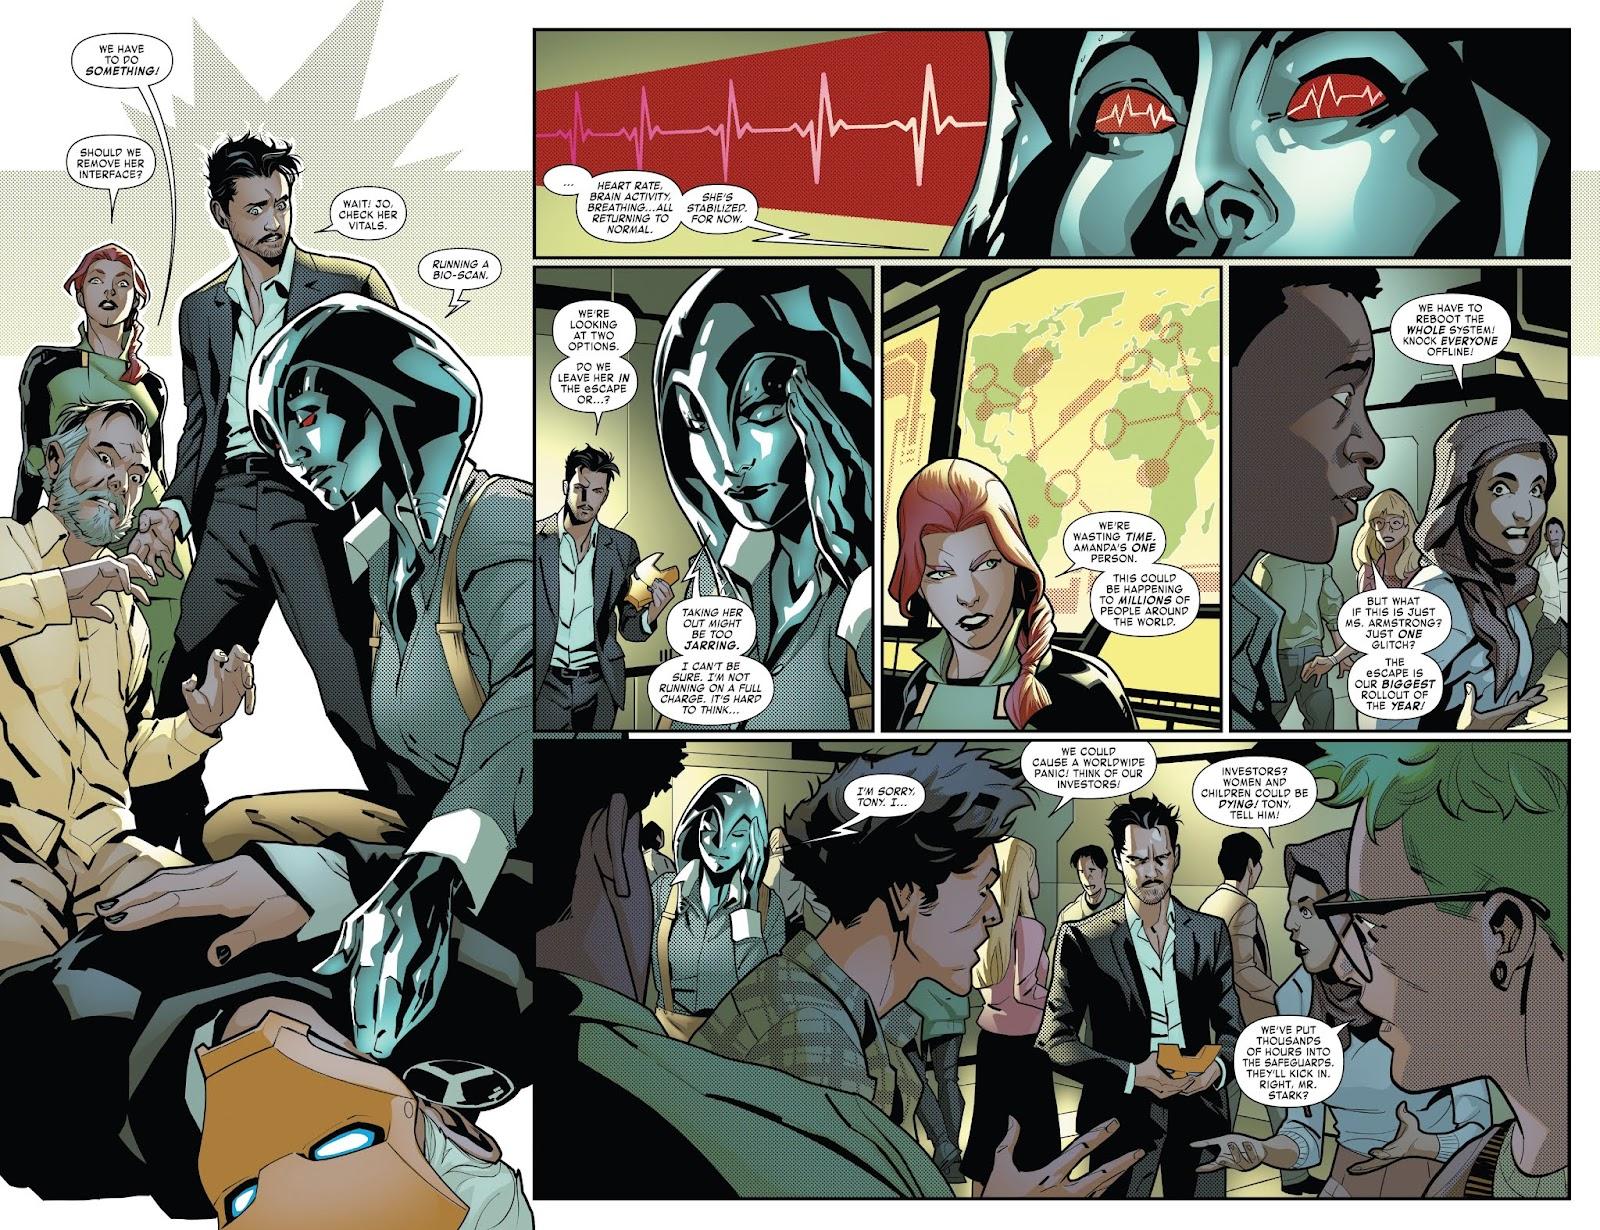 Read online Tony Stark: Iron Man comic -  Issue #7 - 11